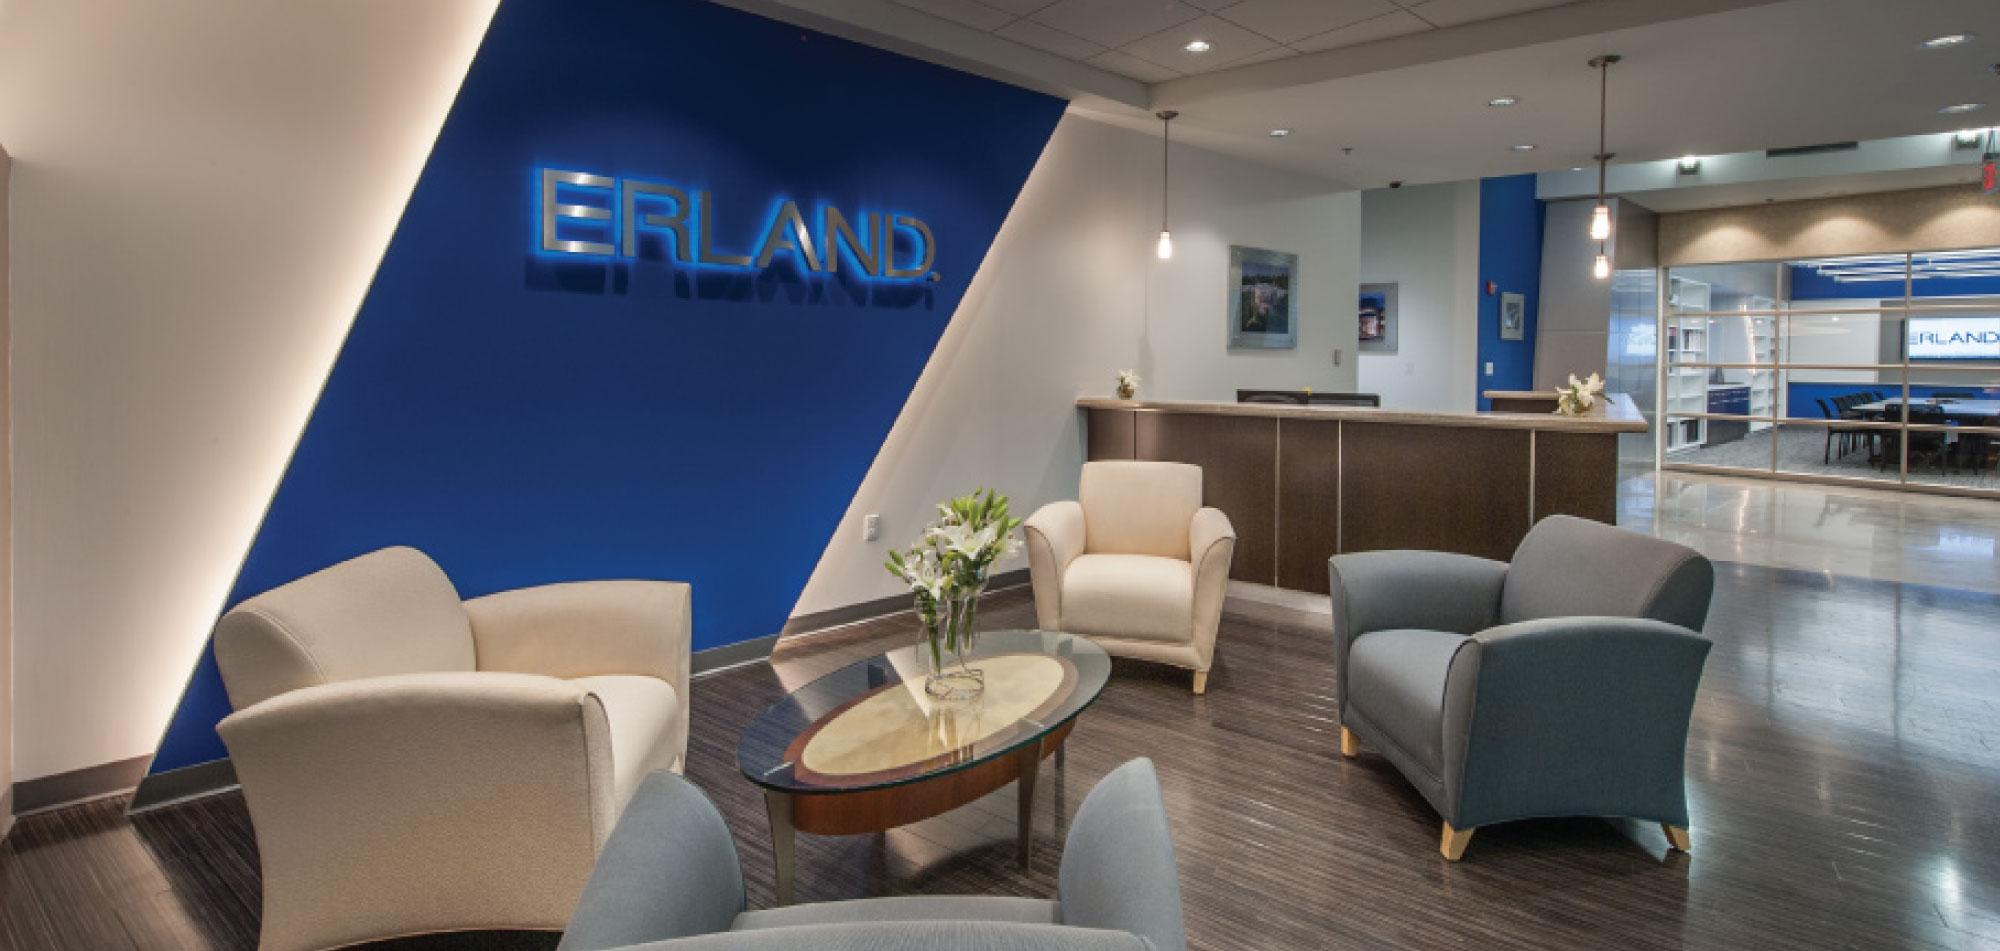 Erland-Lobby-Blog-Post